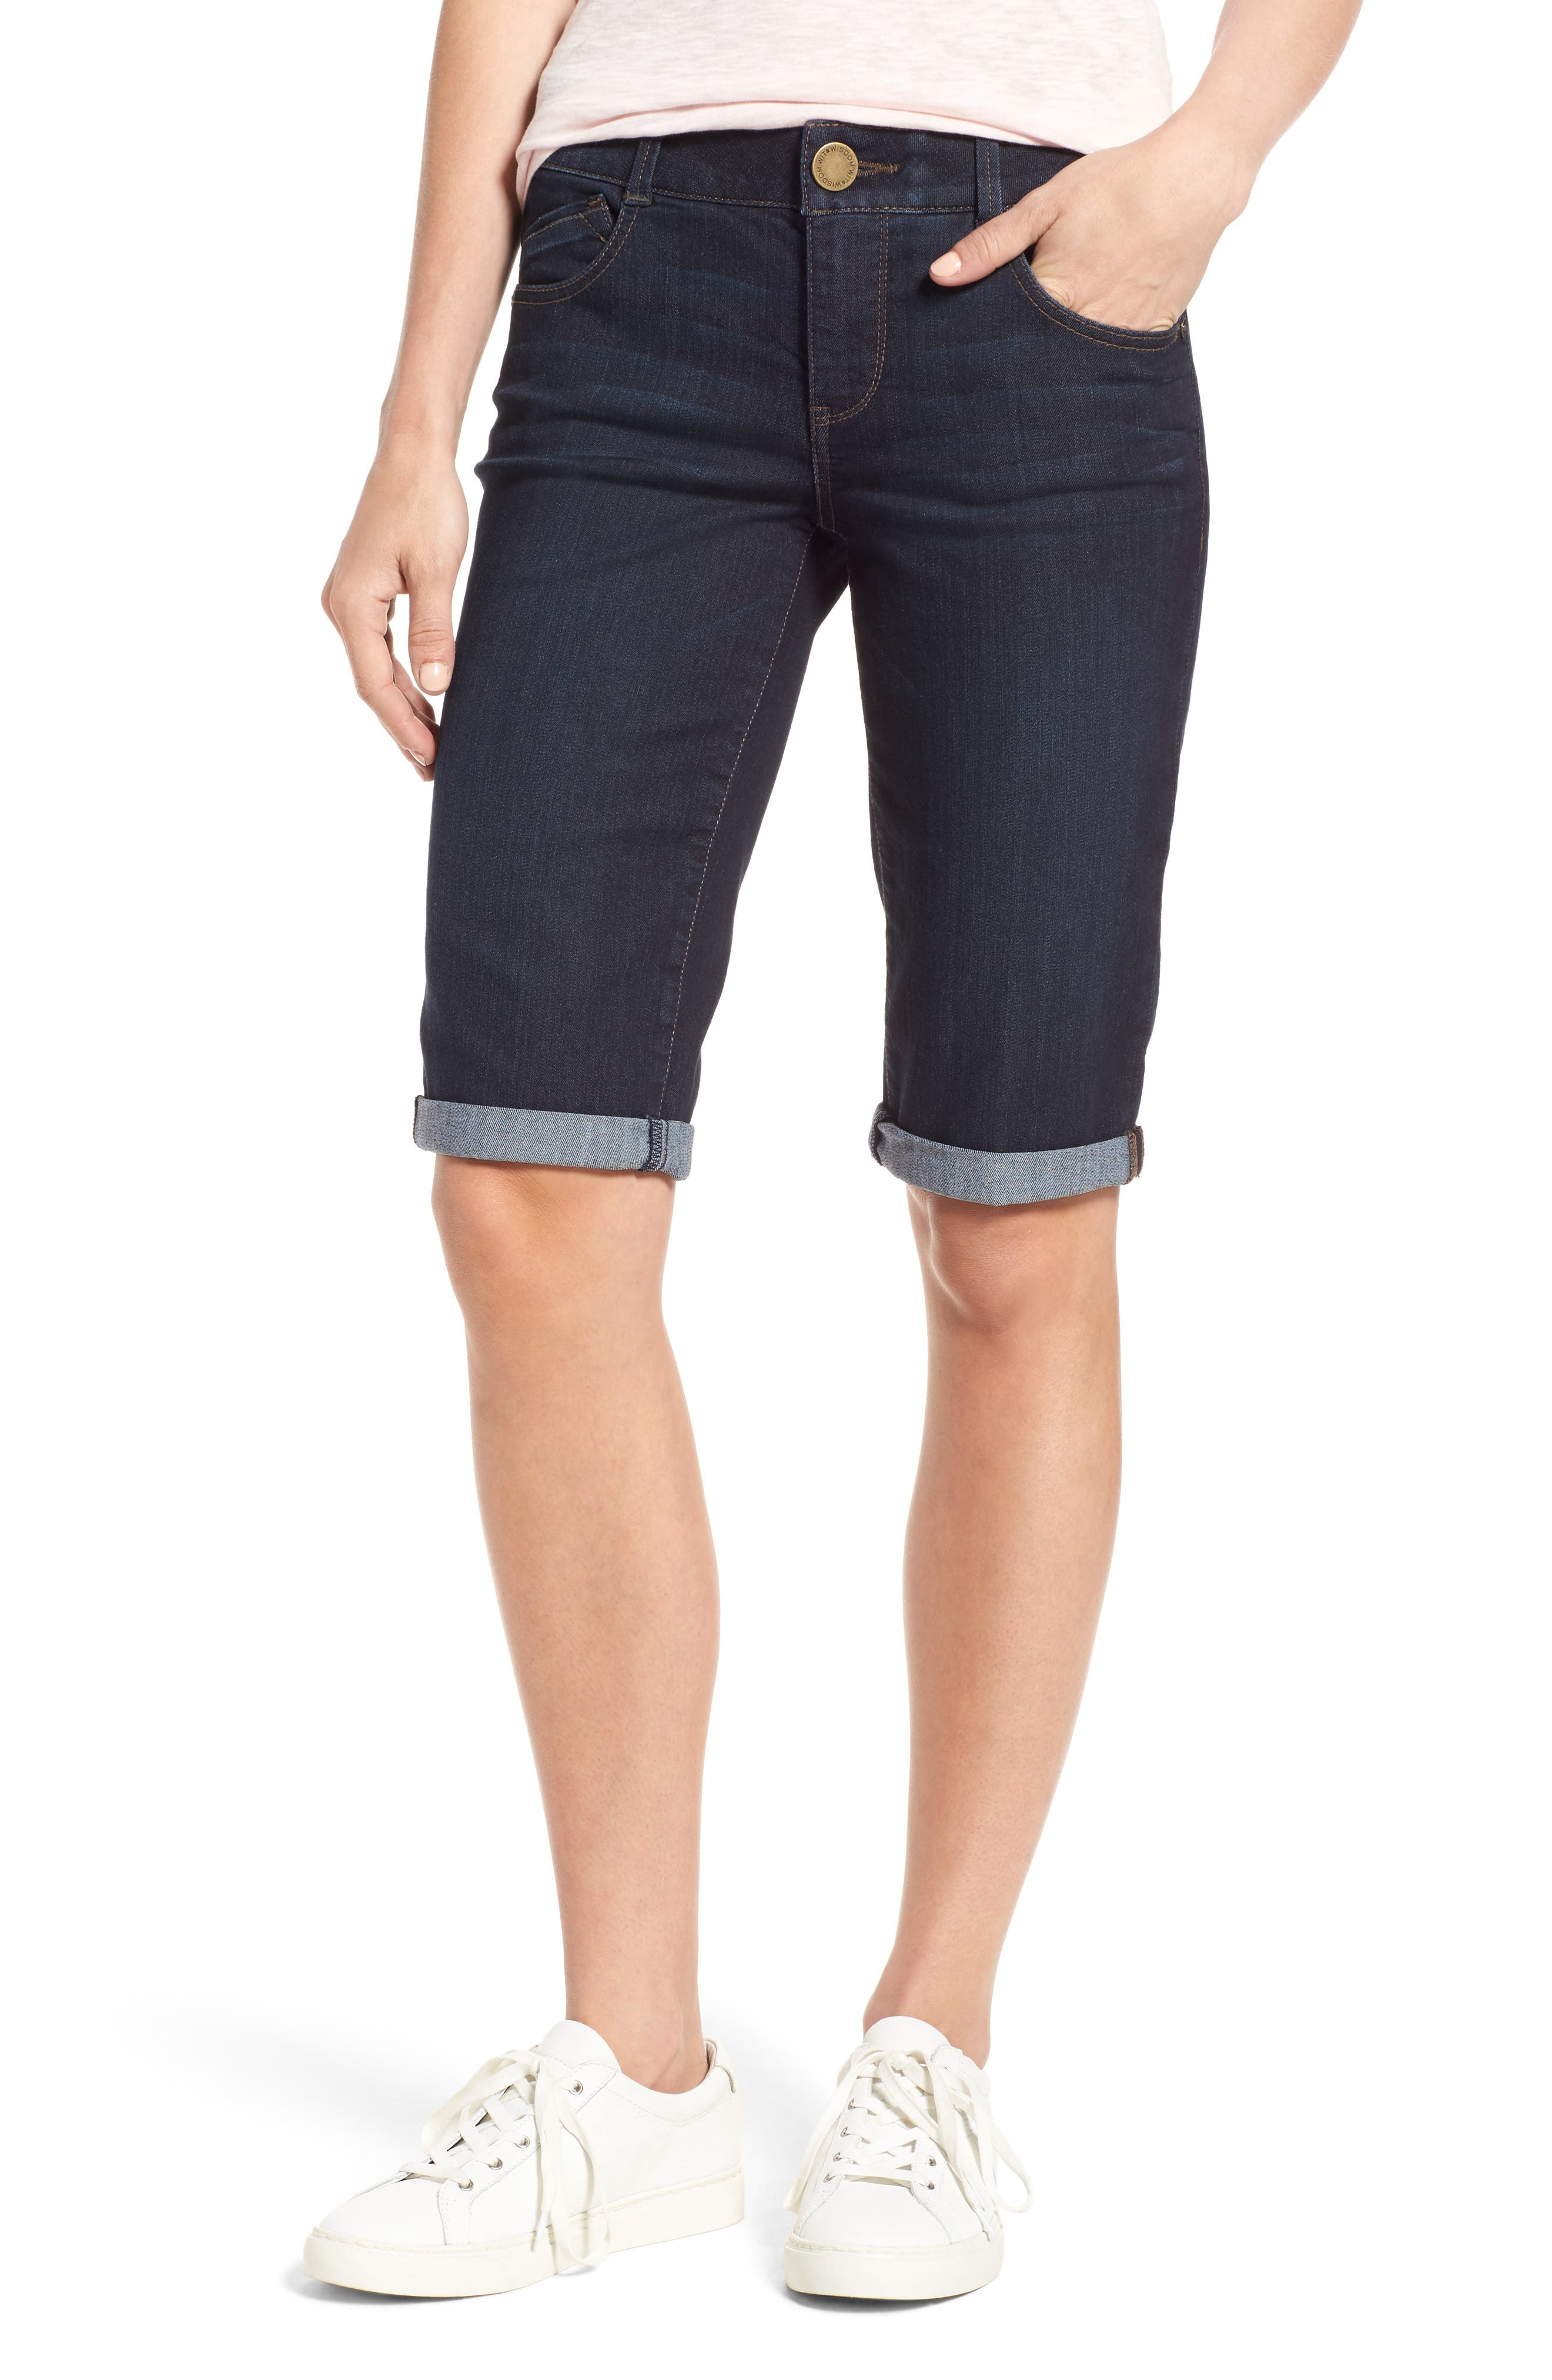 Ab-solution Denim Bermuda Shorts,                         Main,                         color, Indigo